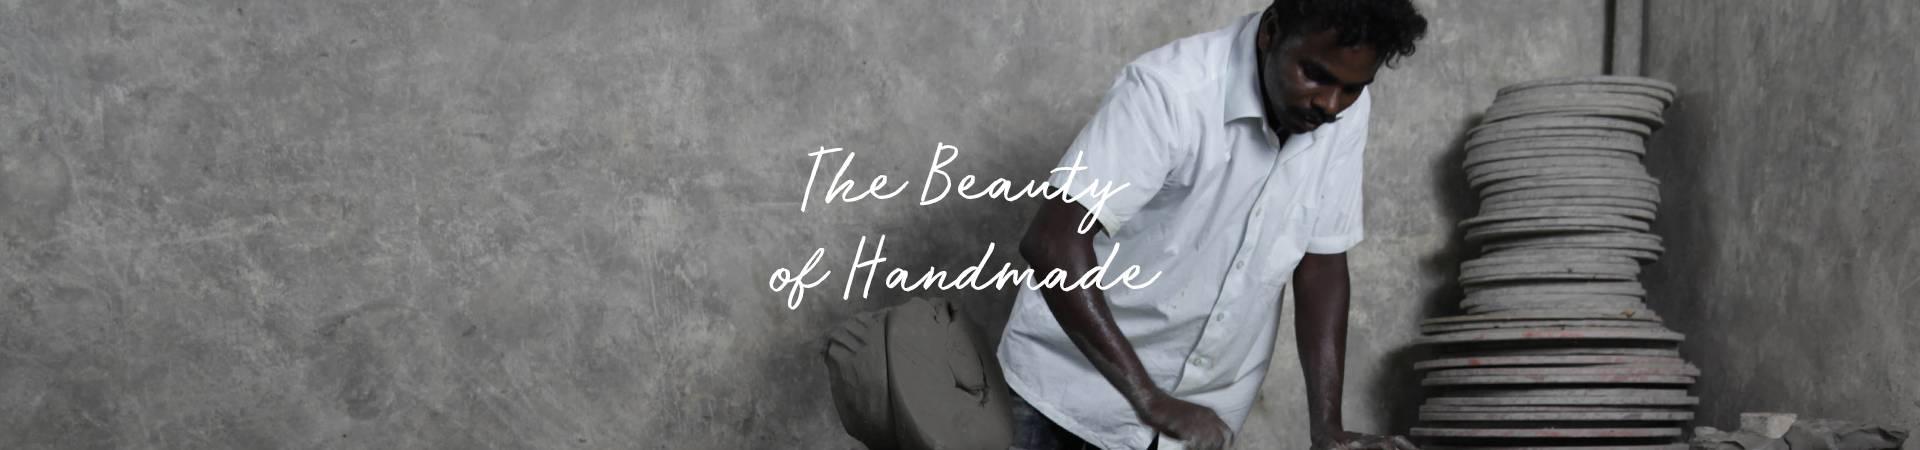 Nkuku_Beauty of Handmade_Header_1.jpg